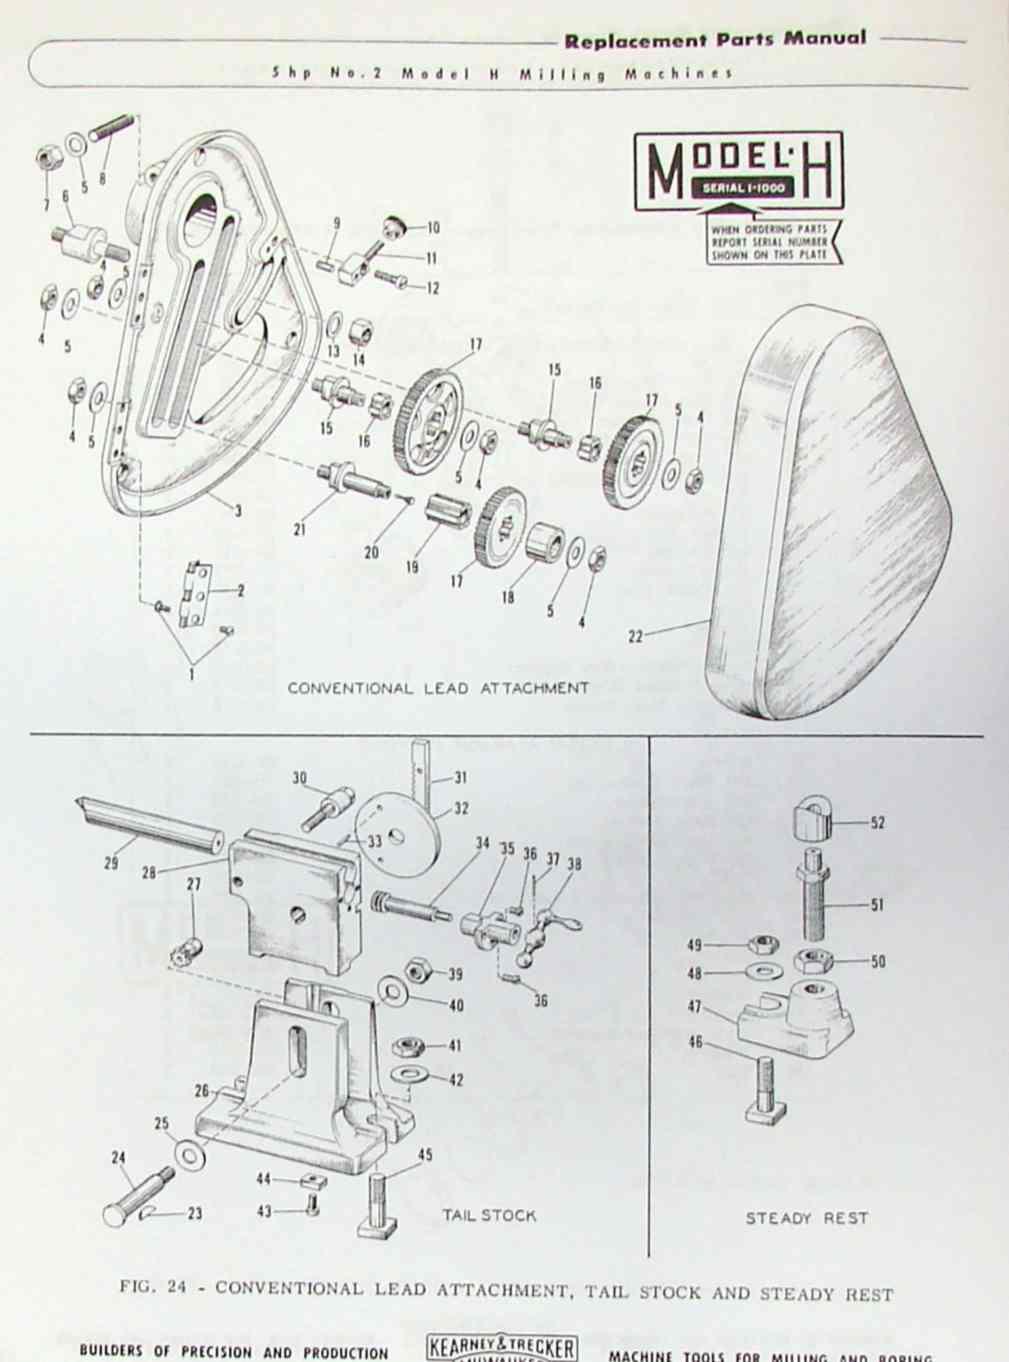 Milling Machine Parts Diagram | Kearney Trecker Milwaukee Model H 2h Milling Machines Parts Manual